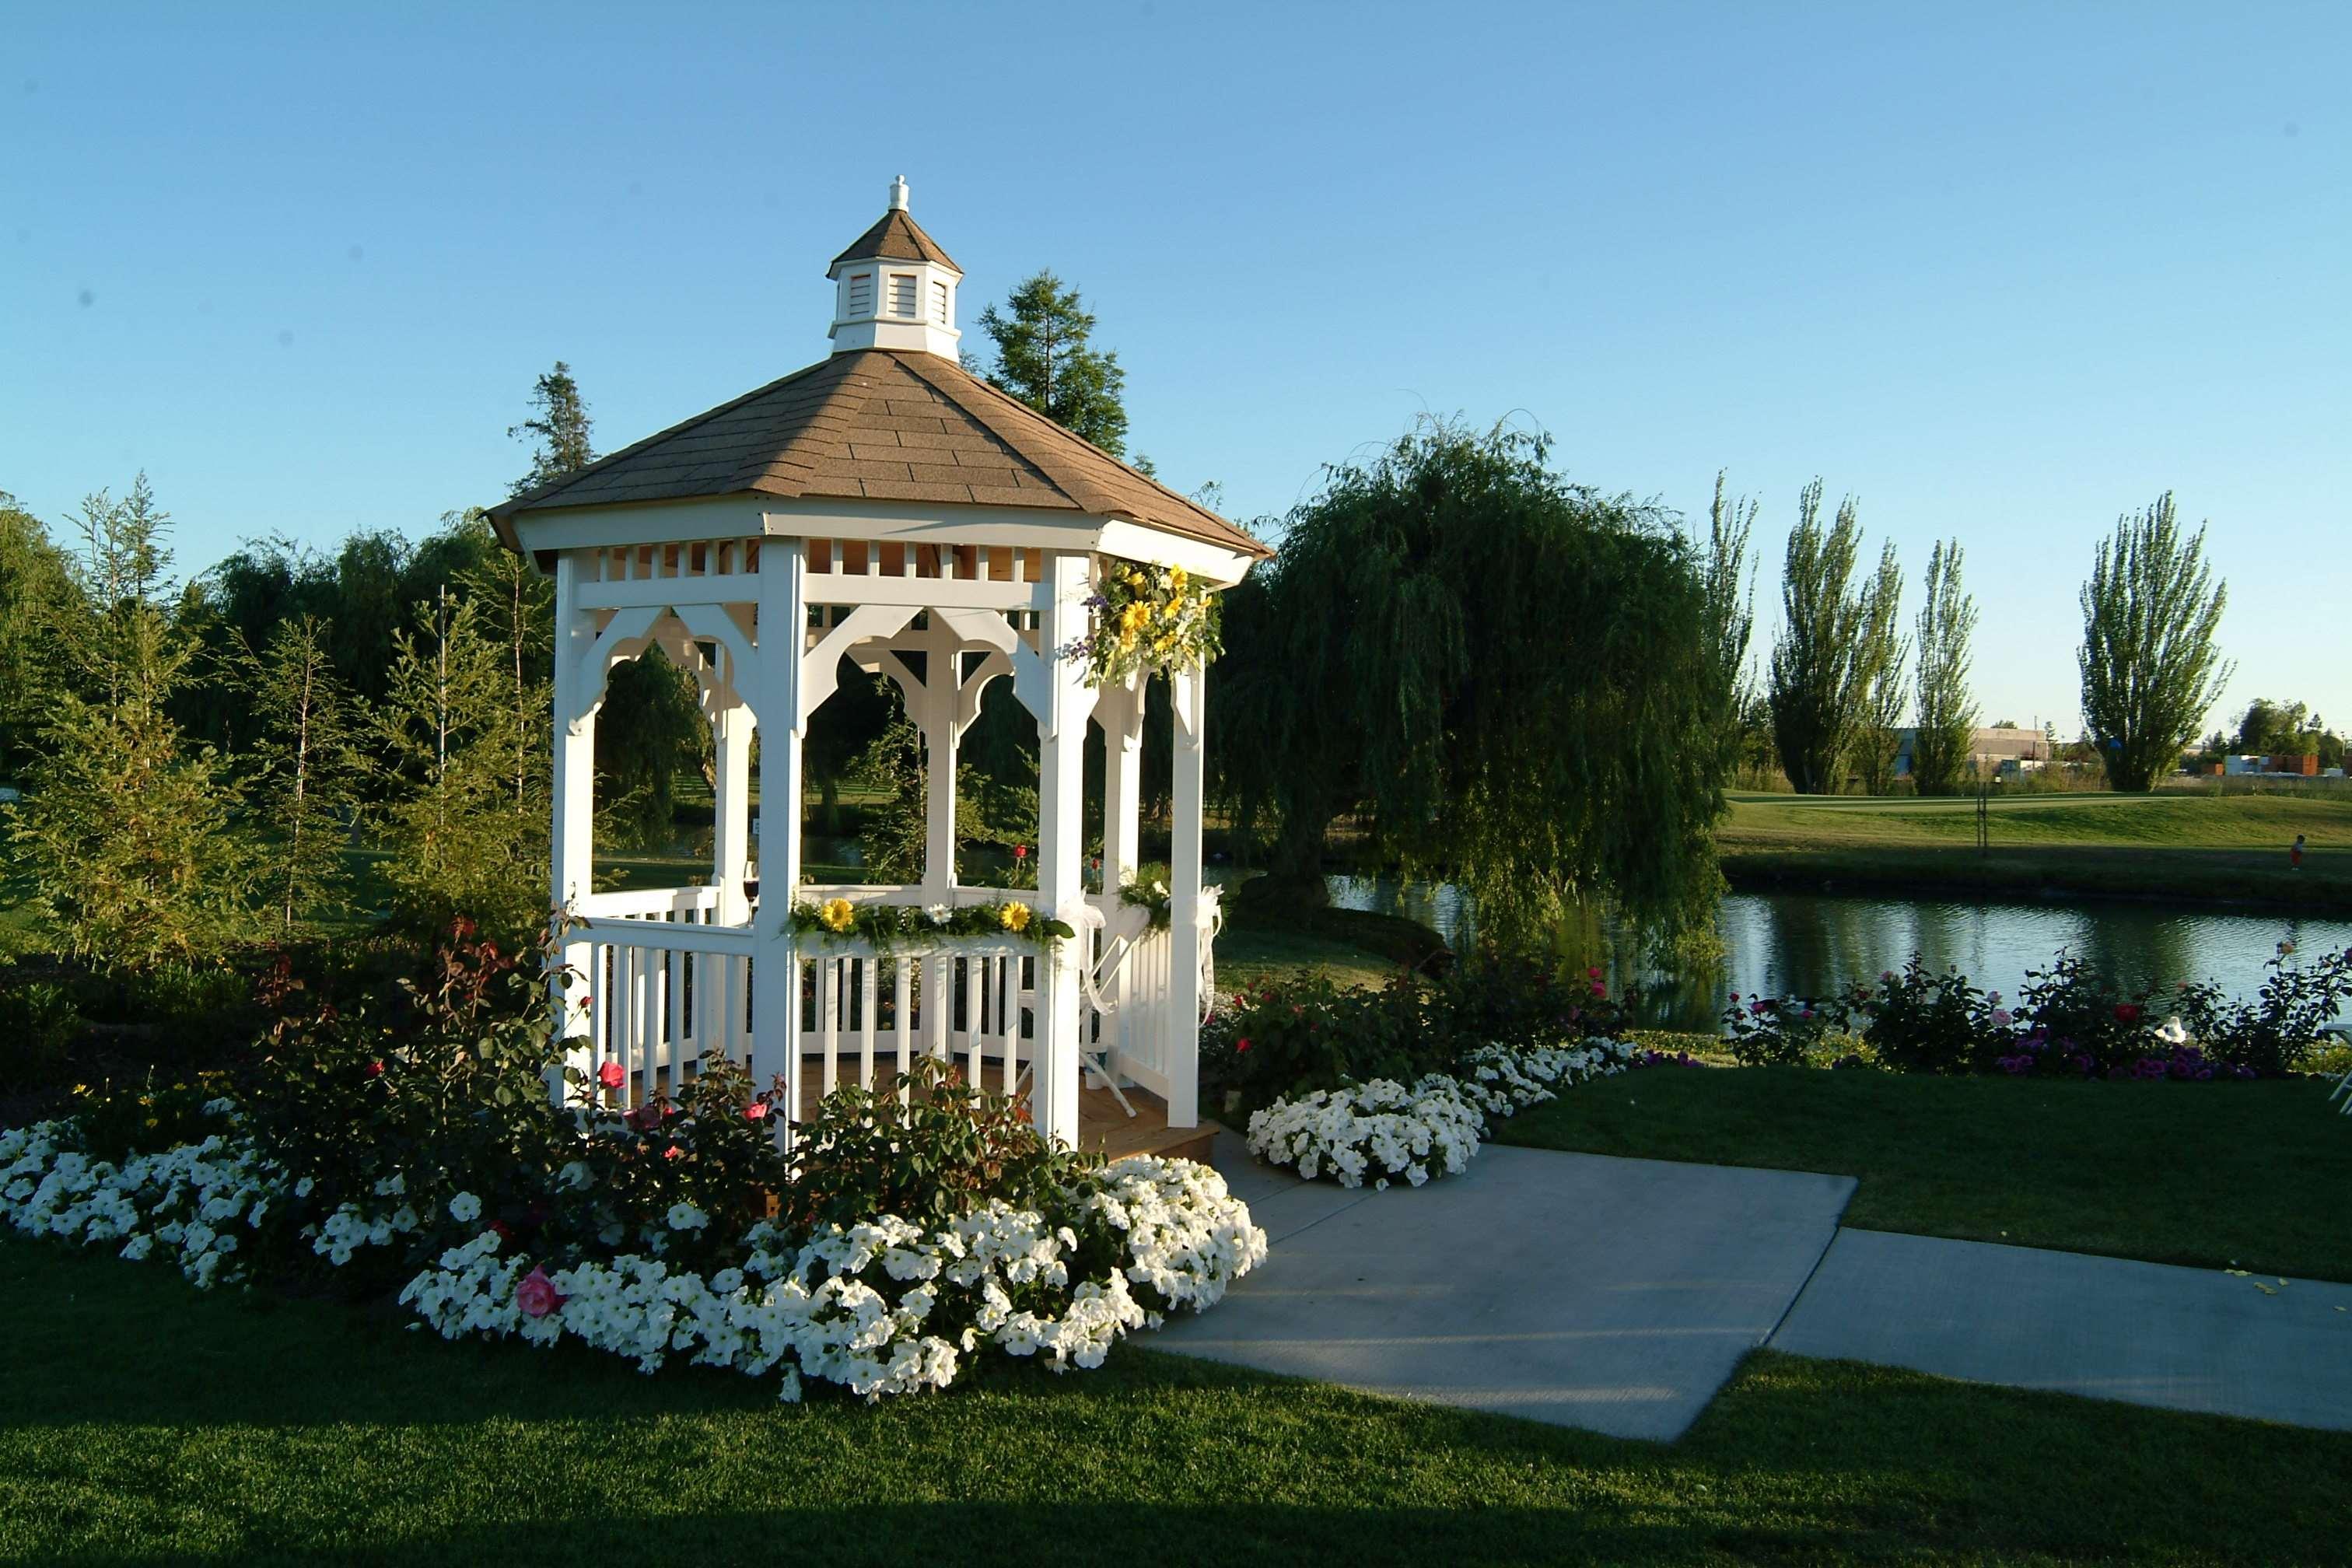 Hampton Inn & Suites Rohnert Park - Sonoma County image 19